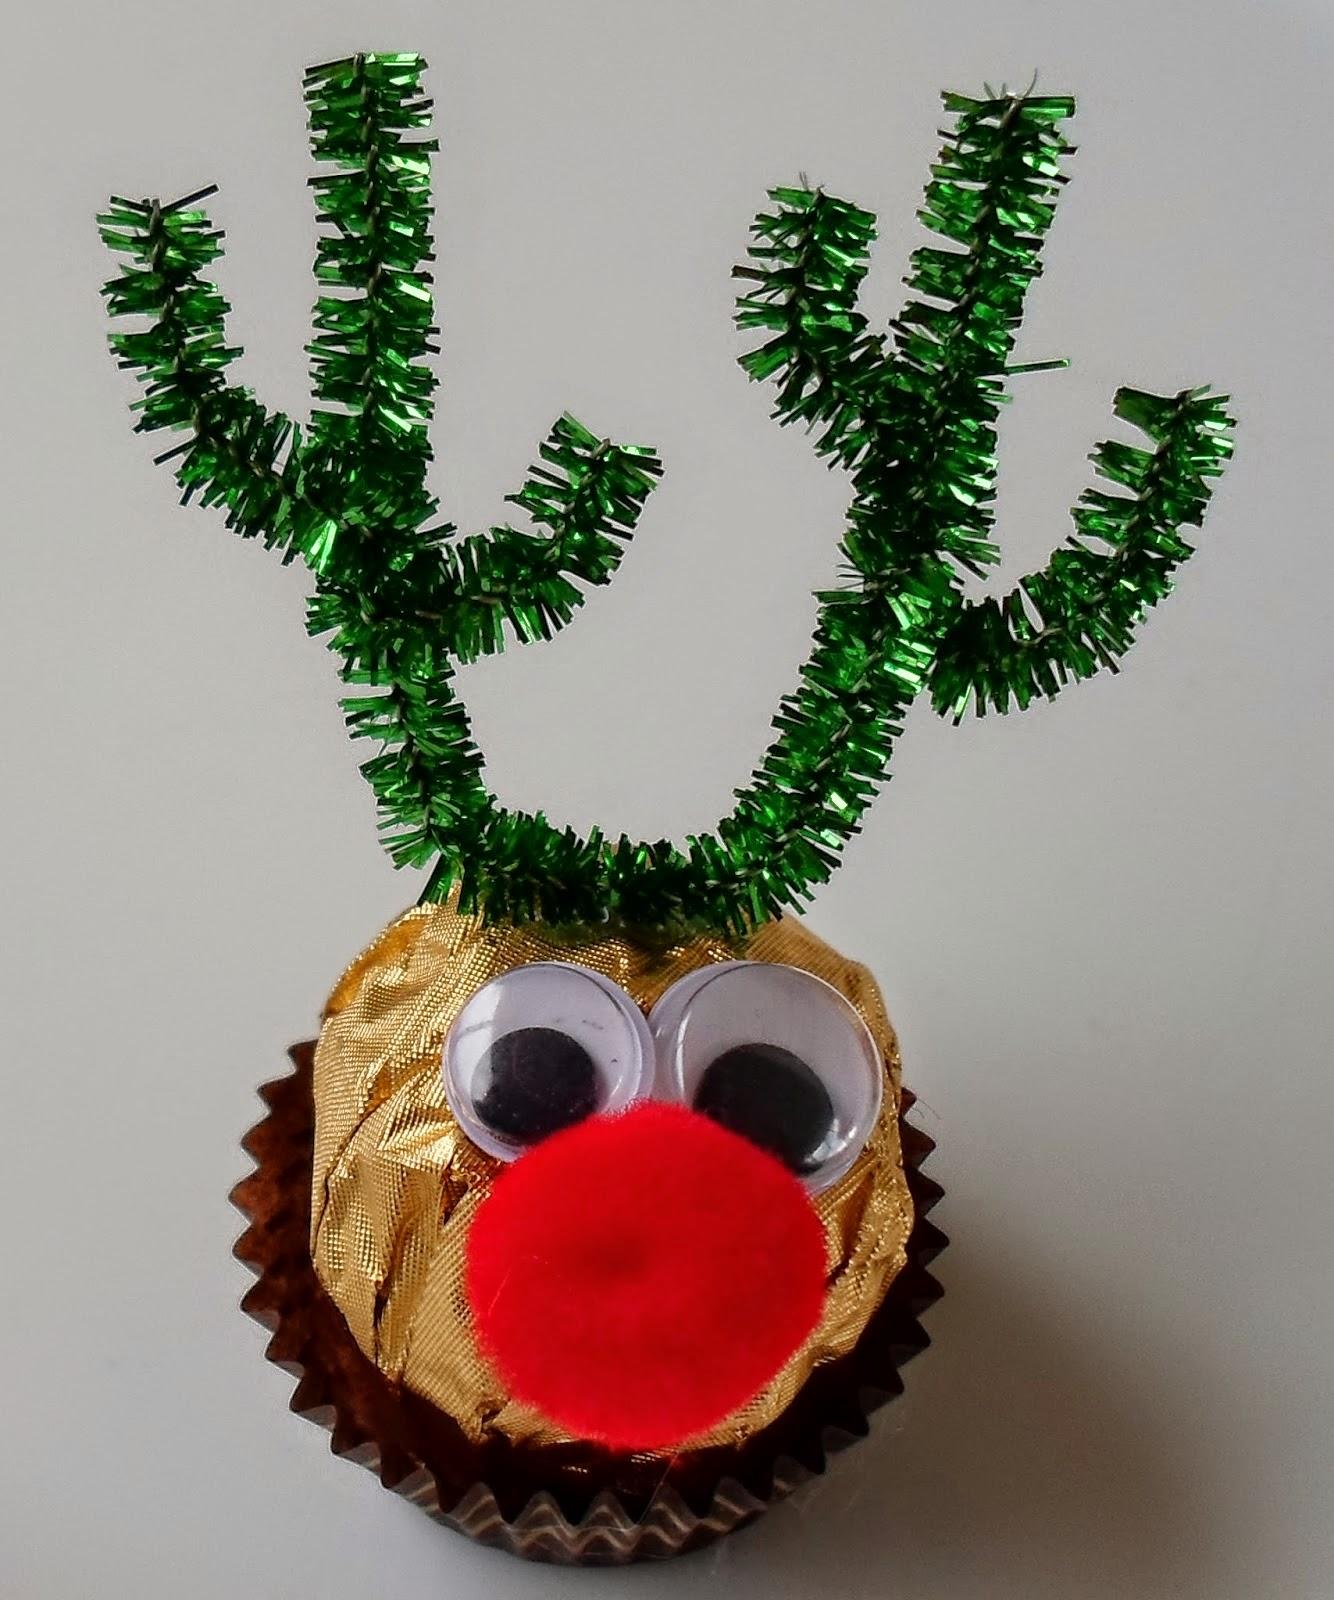 http://happierthanapiginmud.blogspot.com/2014/12/ferrero-rocher-reindeer.html